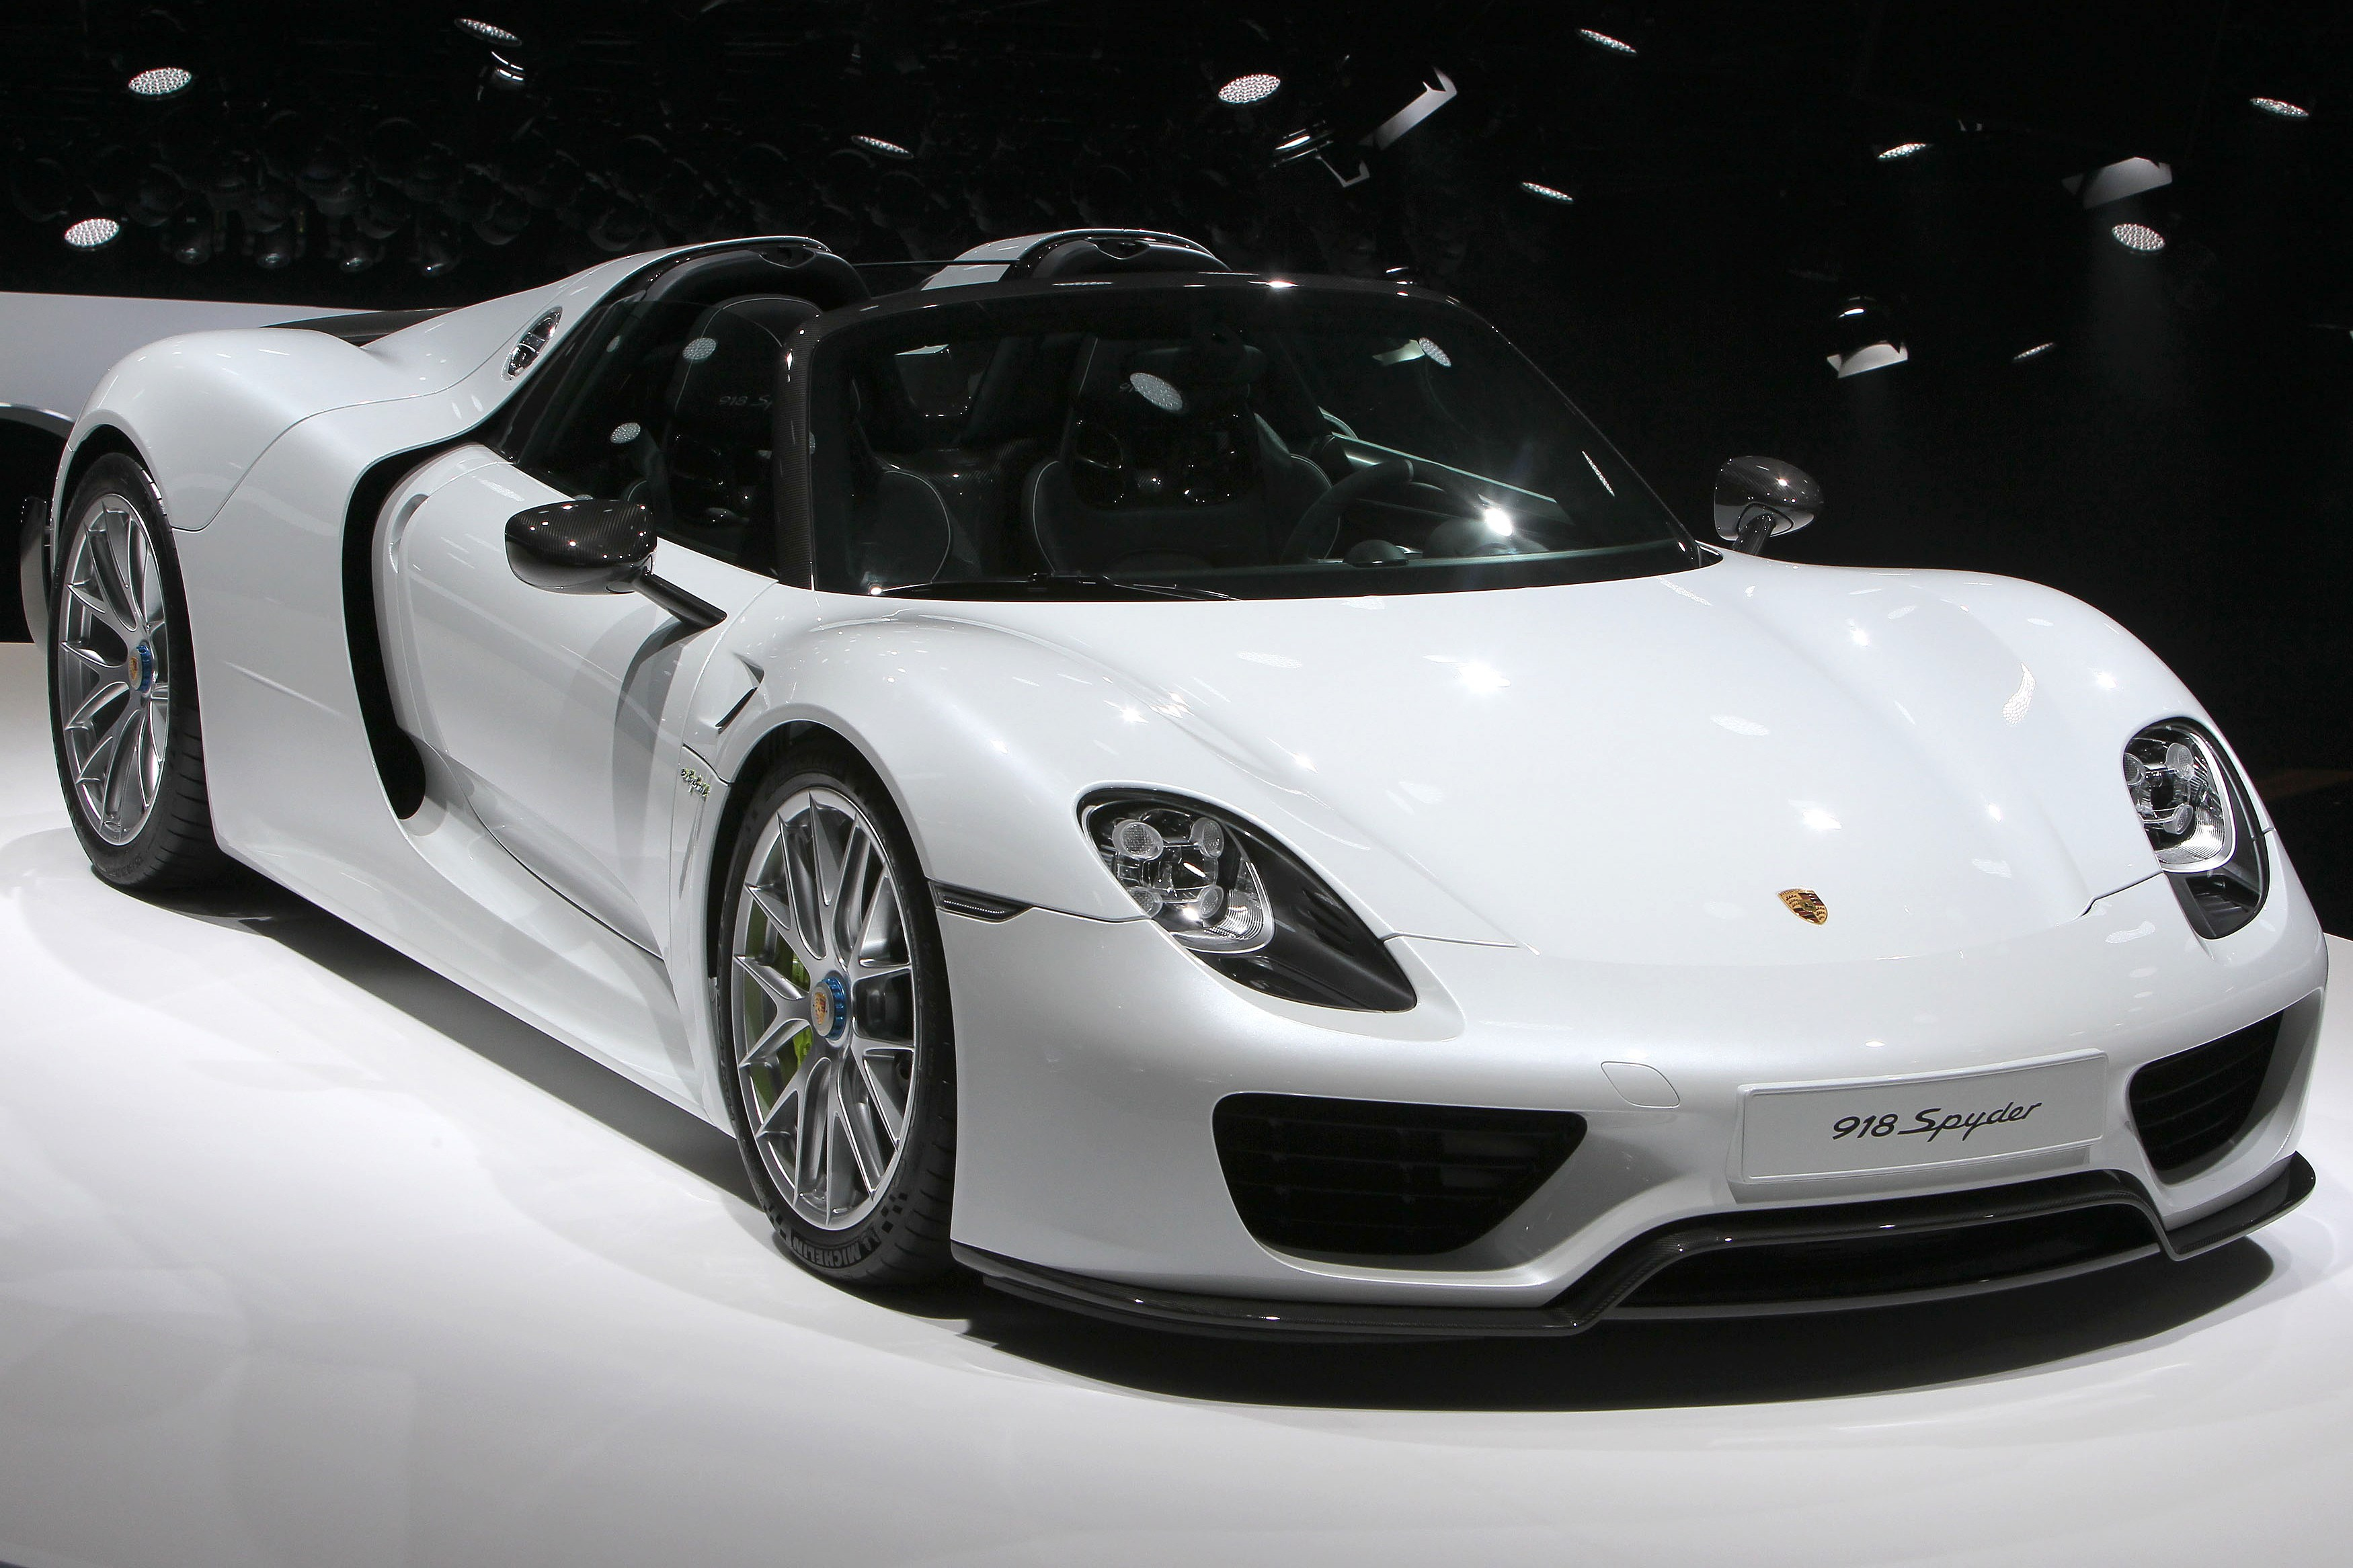 488286534-germany-economy-automobile-show-iaa Fascinating Porsche 918 Spyder Fiyat Listesi Cars Trend